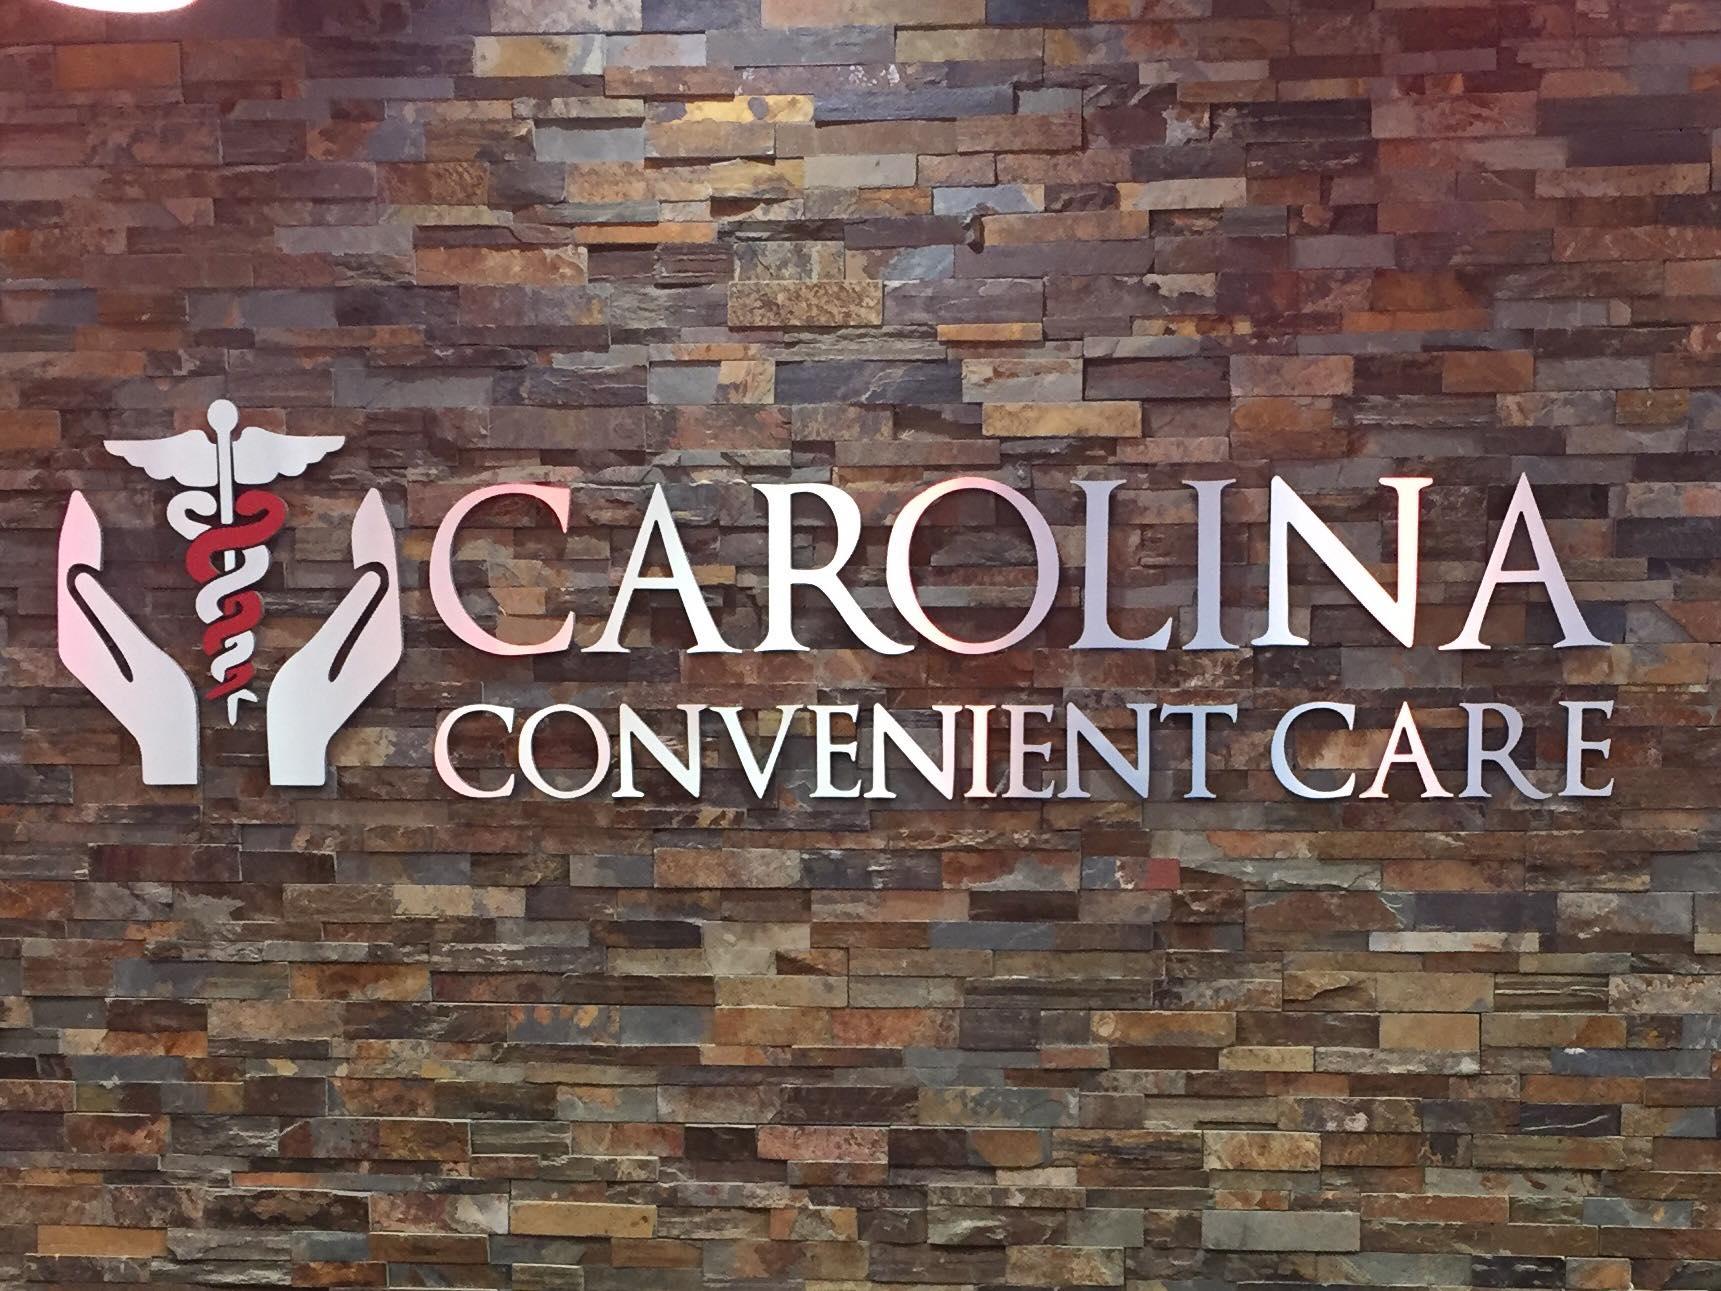 Carolina Convenient Care